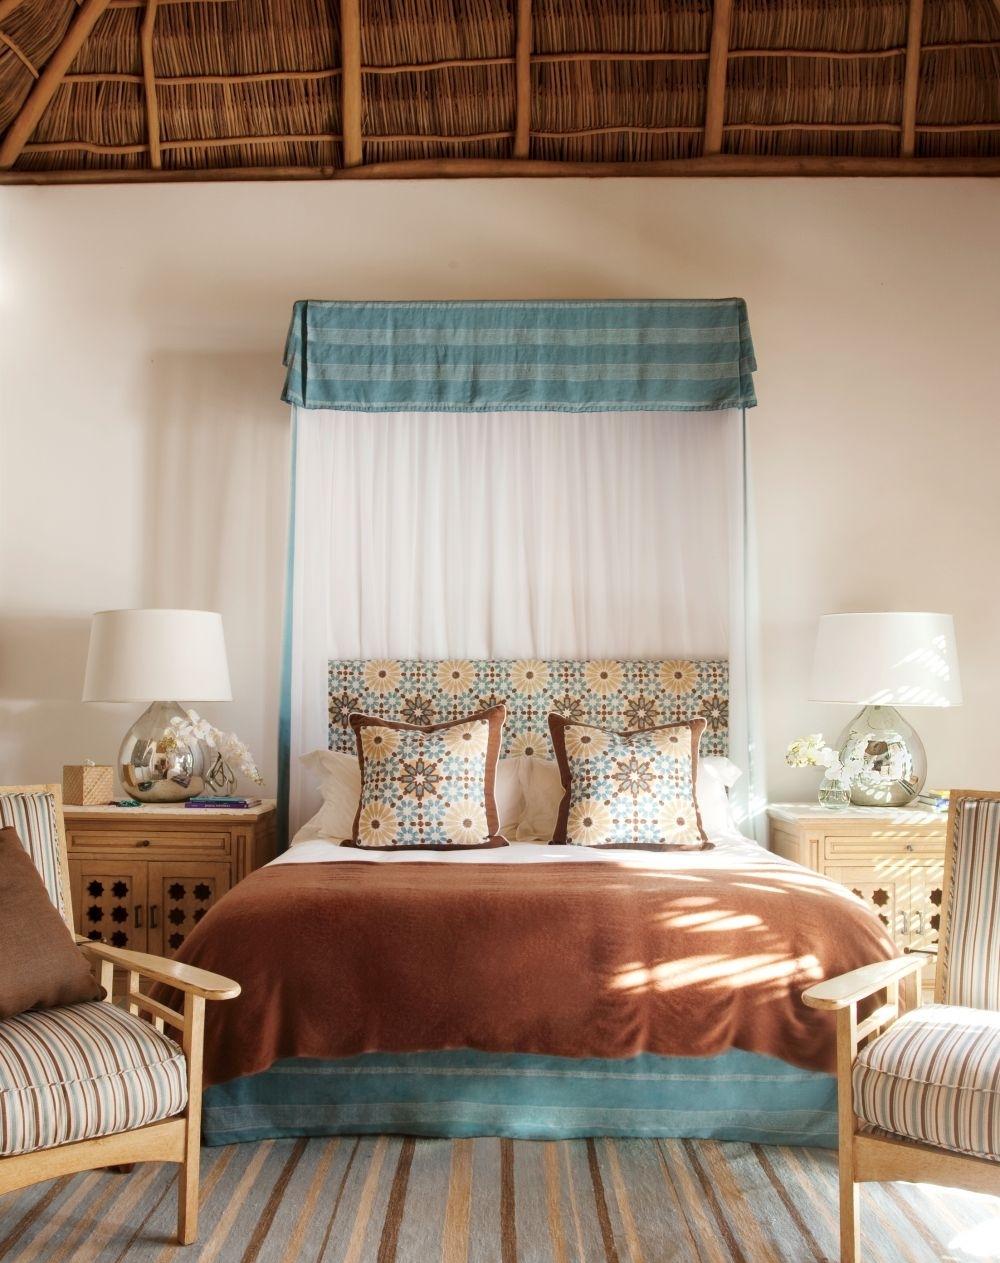 Beautiful Boho Chic Bedroom Designs - Interior Vogue on Bohemian Bedroom Ideas  id=17534